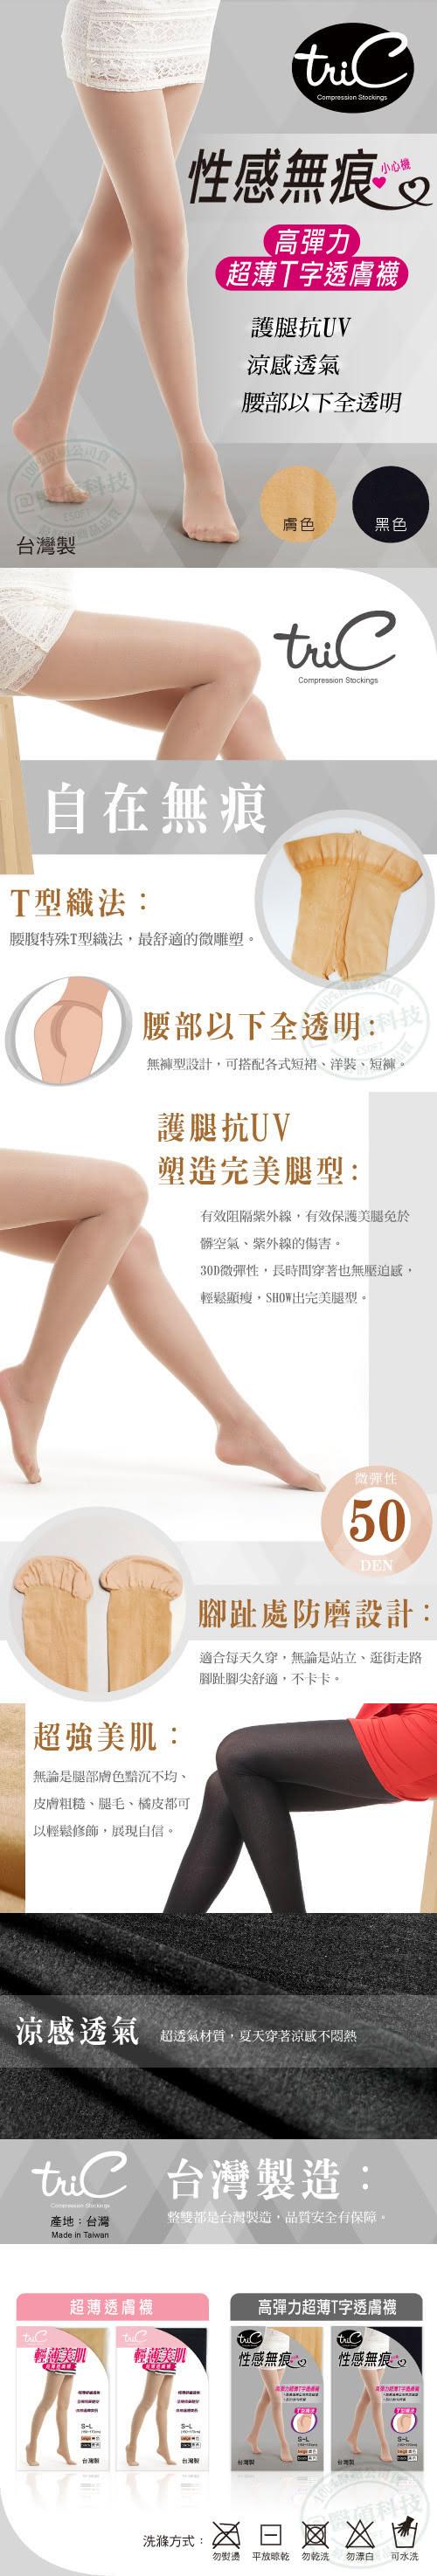 【Tric】台灣製 50Den*6雙 高彈力超薄美肌T字透膚褲襪 抗UV耐勾(顯瘦腿襪/健康襪/彈力襪)